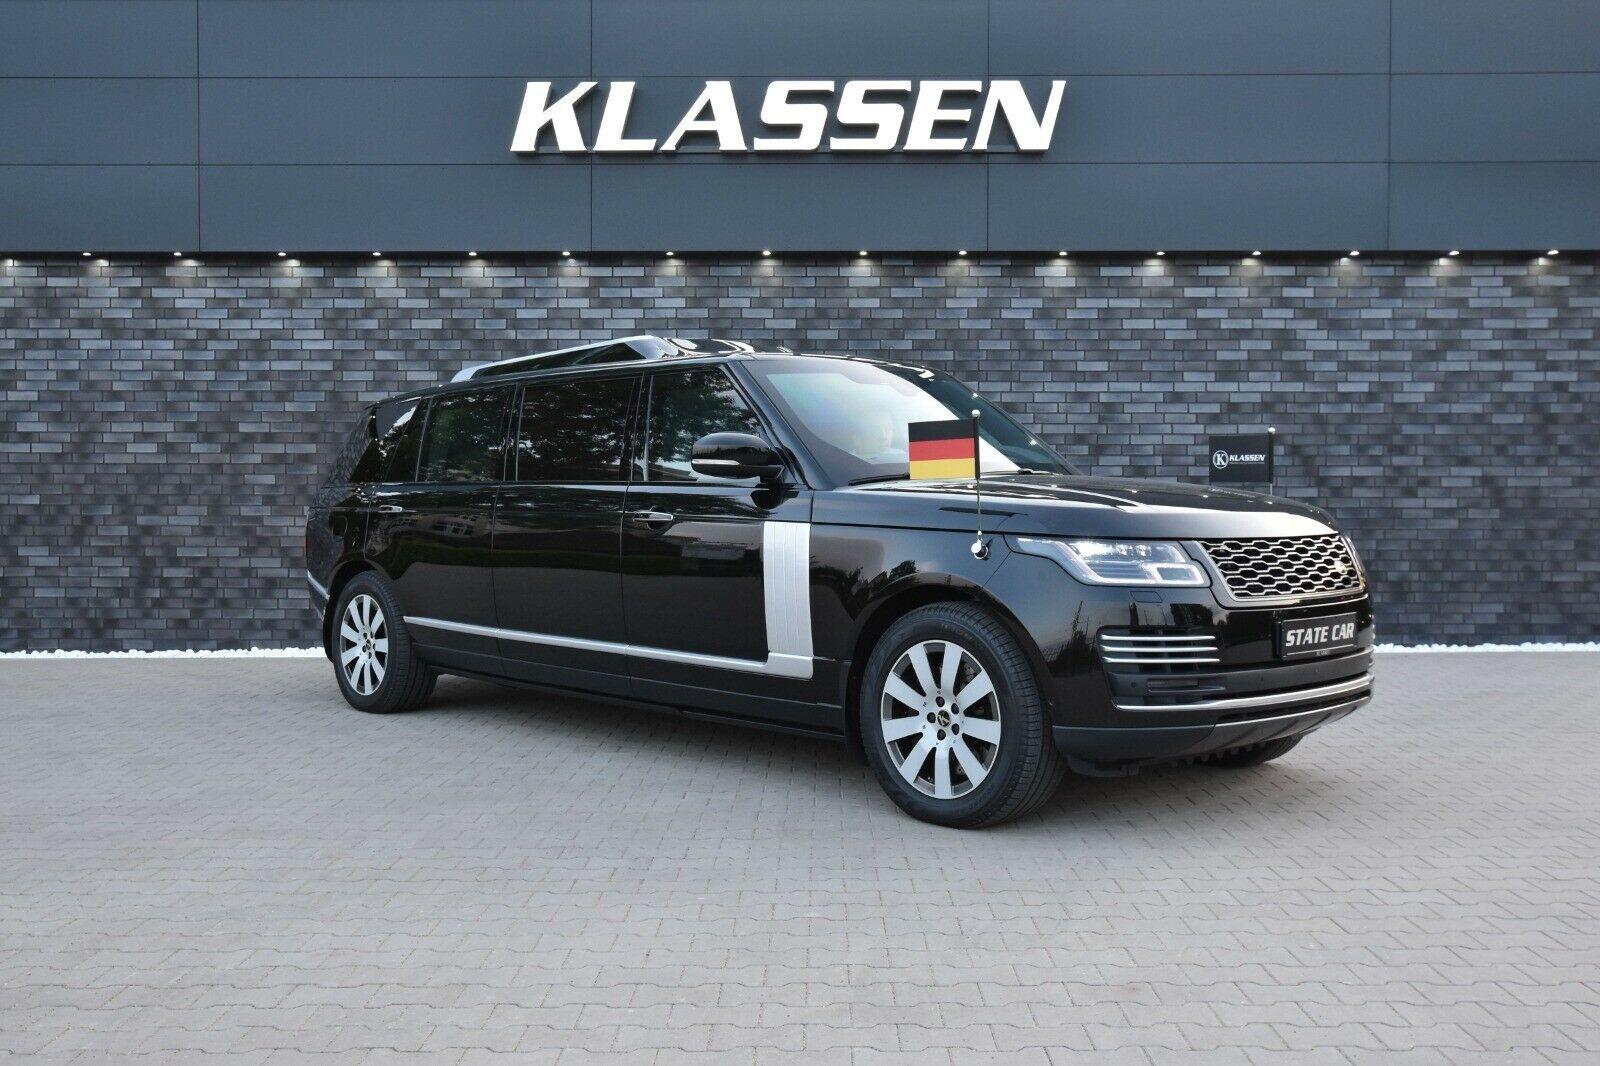 Range-Rover-SVAutobiography-by-Klassen-2